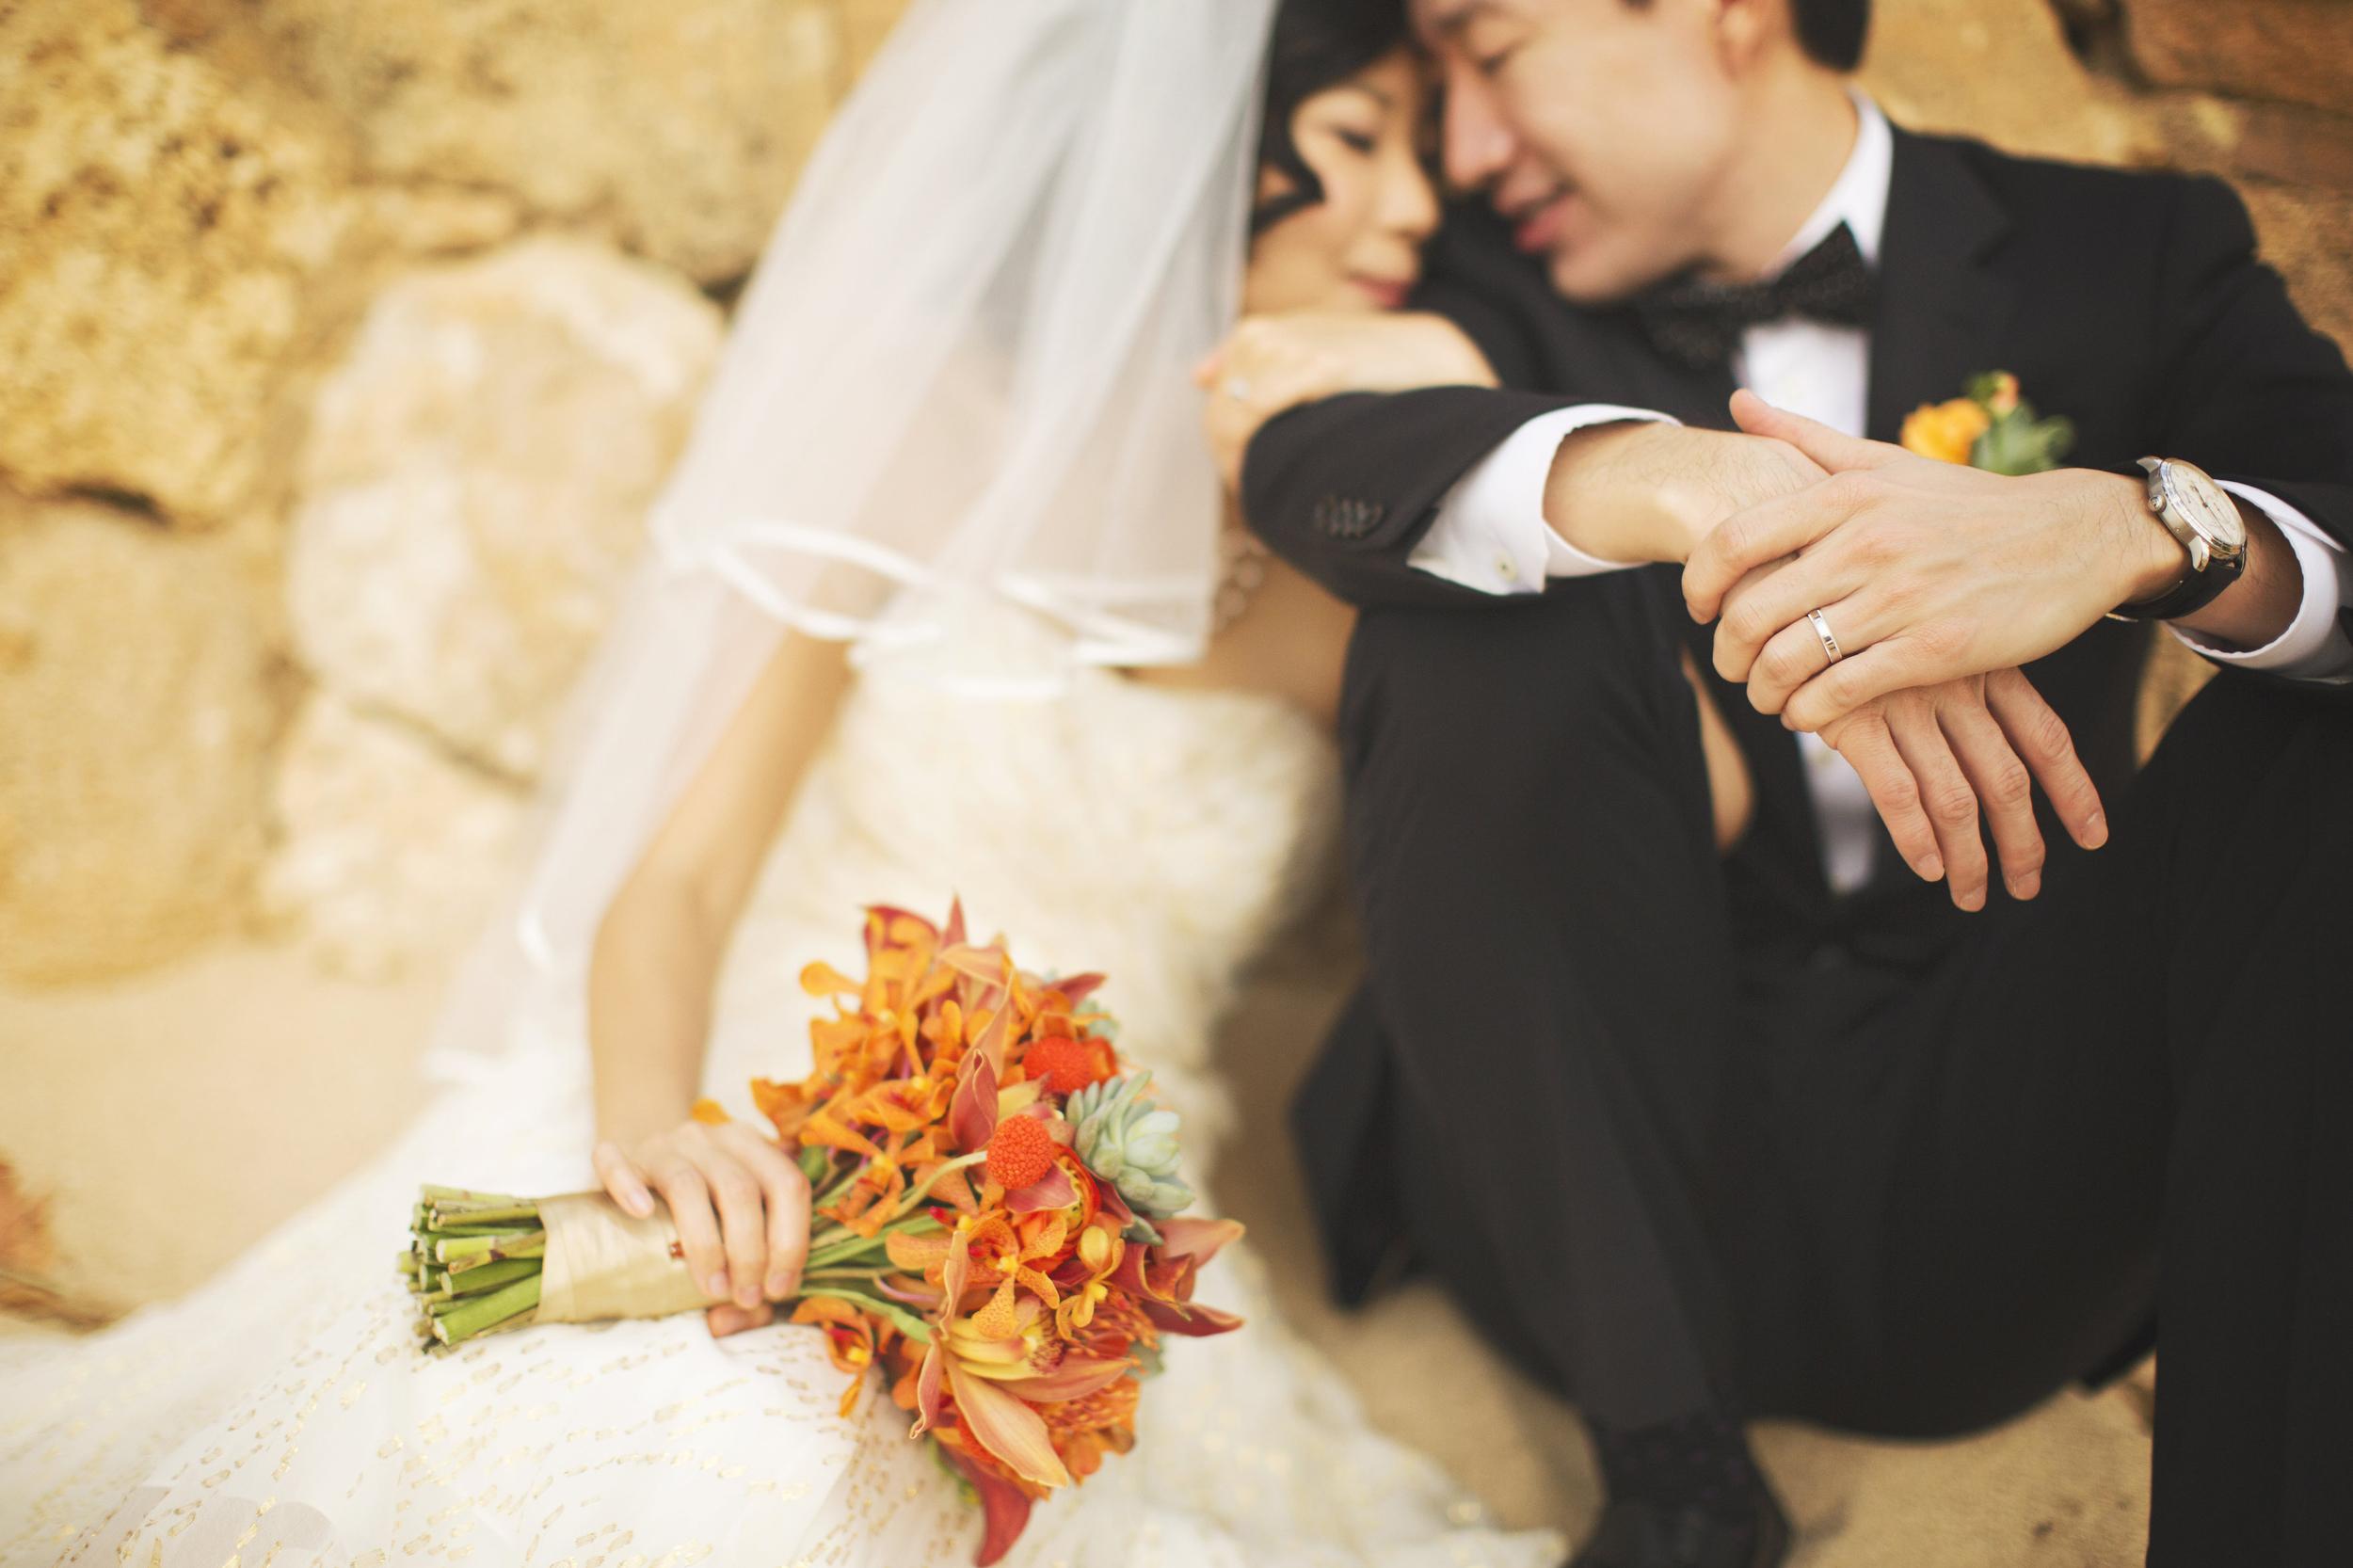 angie-diaz-photography-oahu-wedding-lanikuhonoa-shenshen-marshall-44.jpg